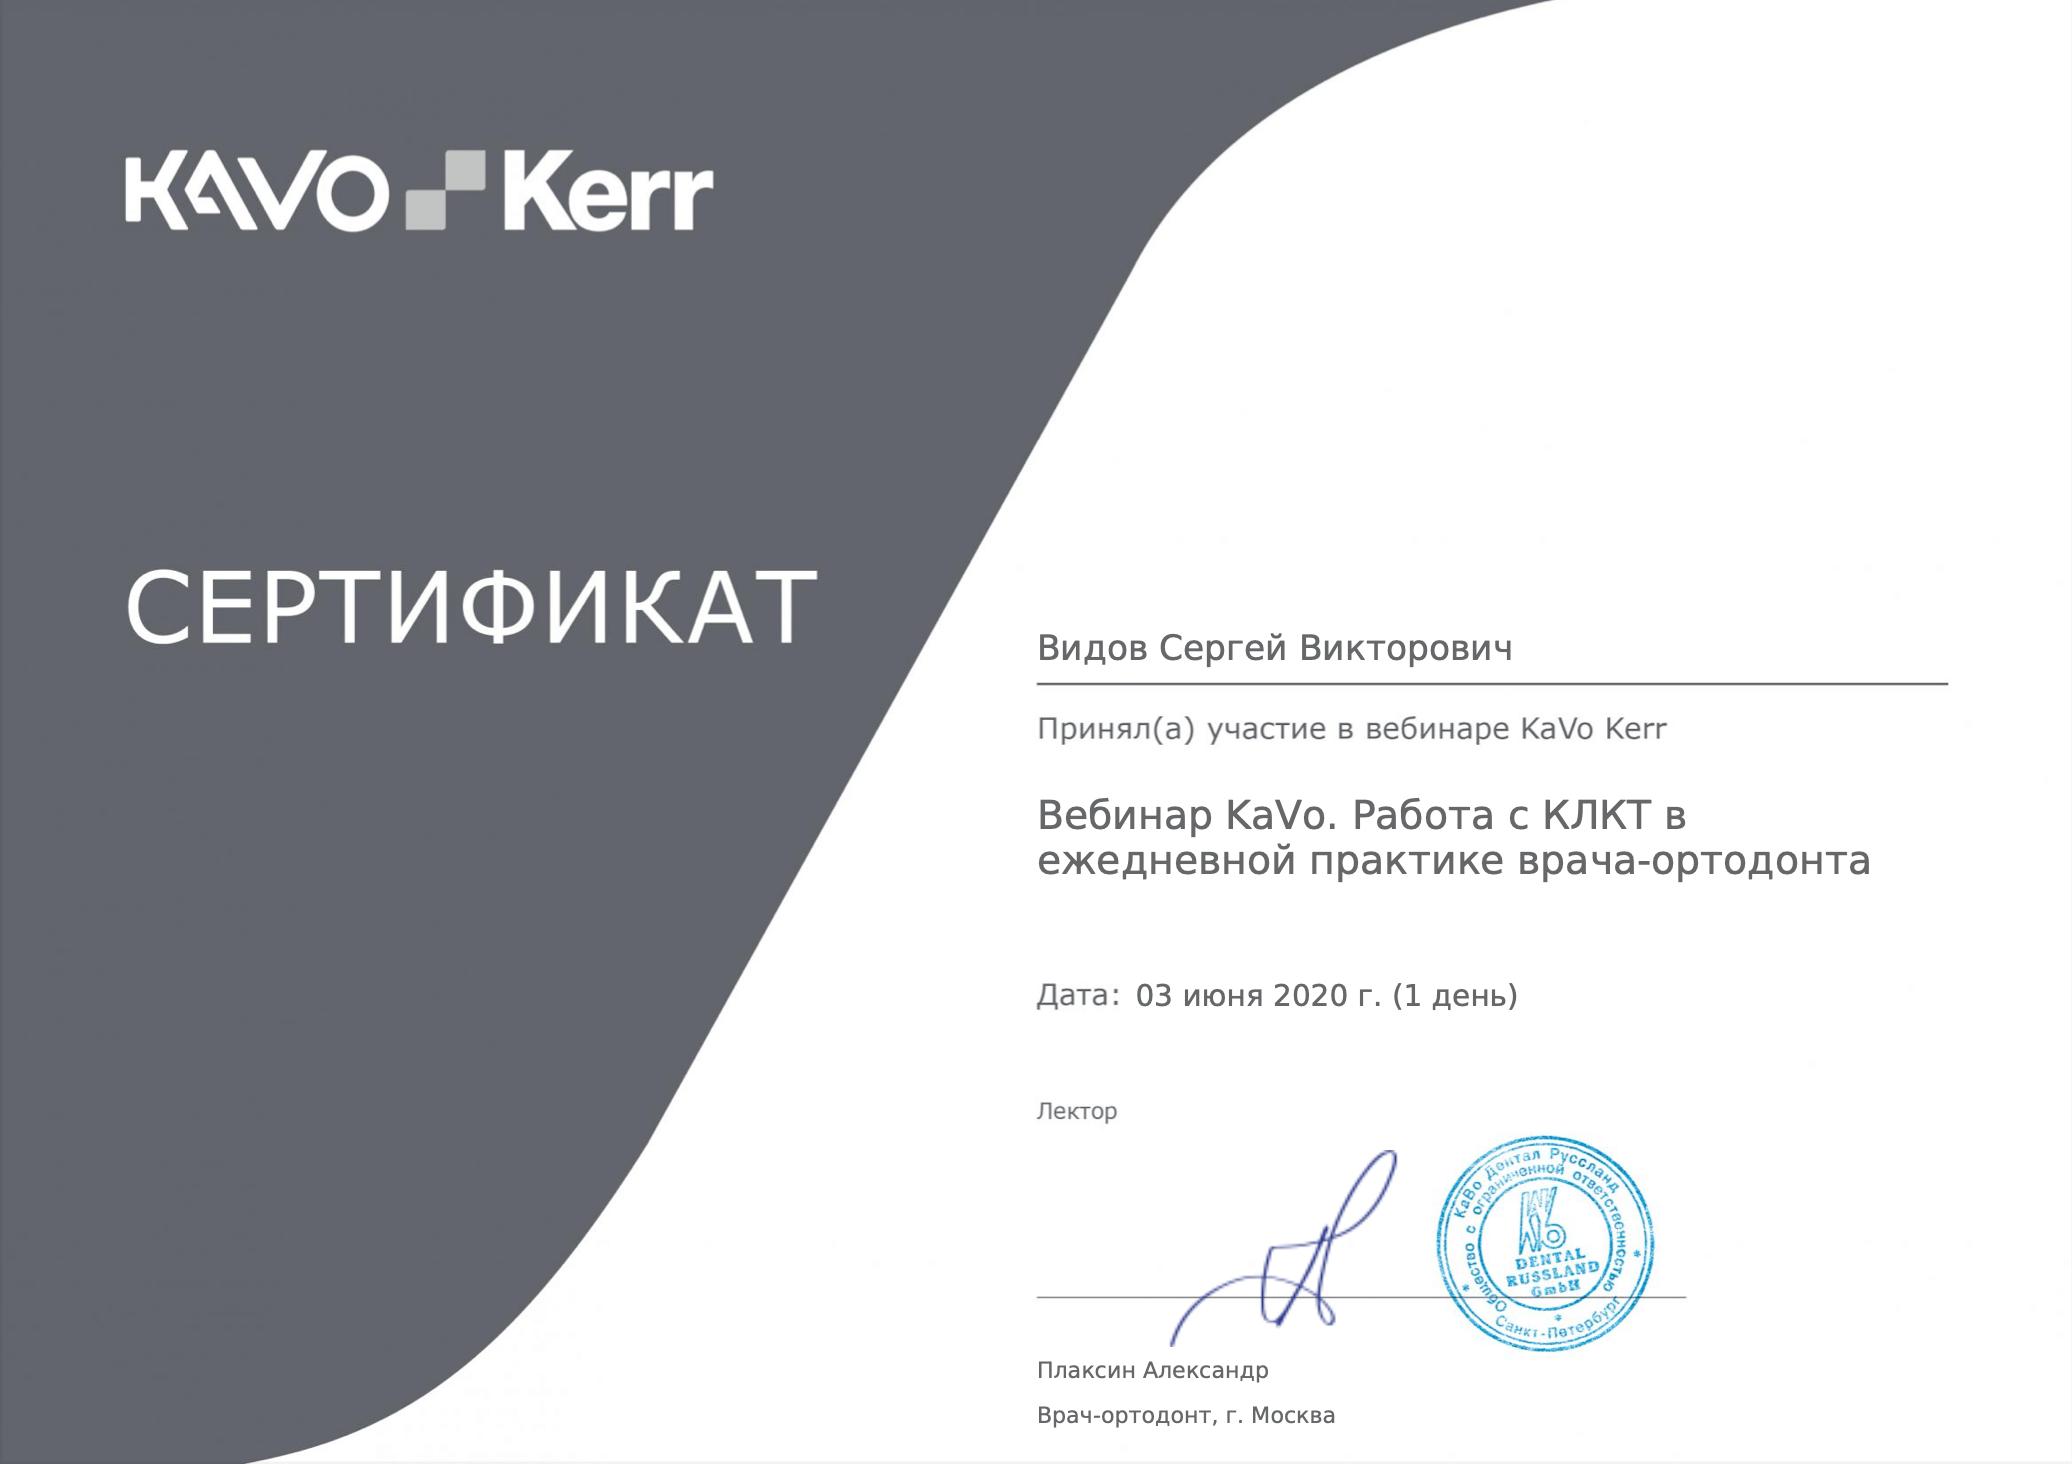 vidov-serghei-victorovich